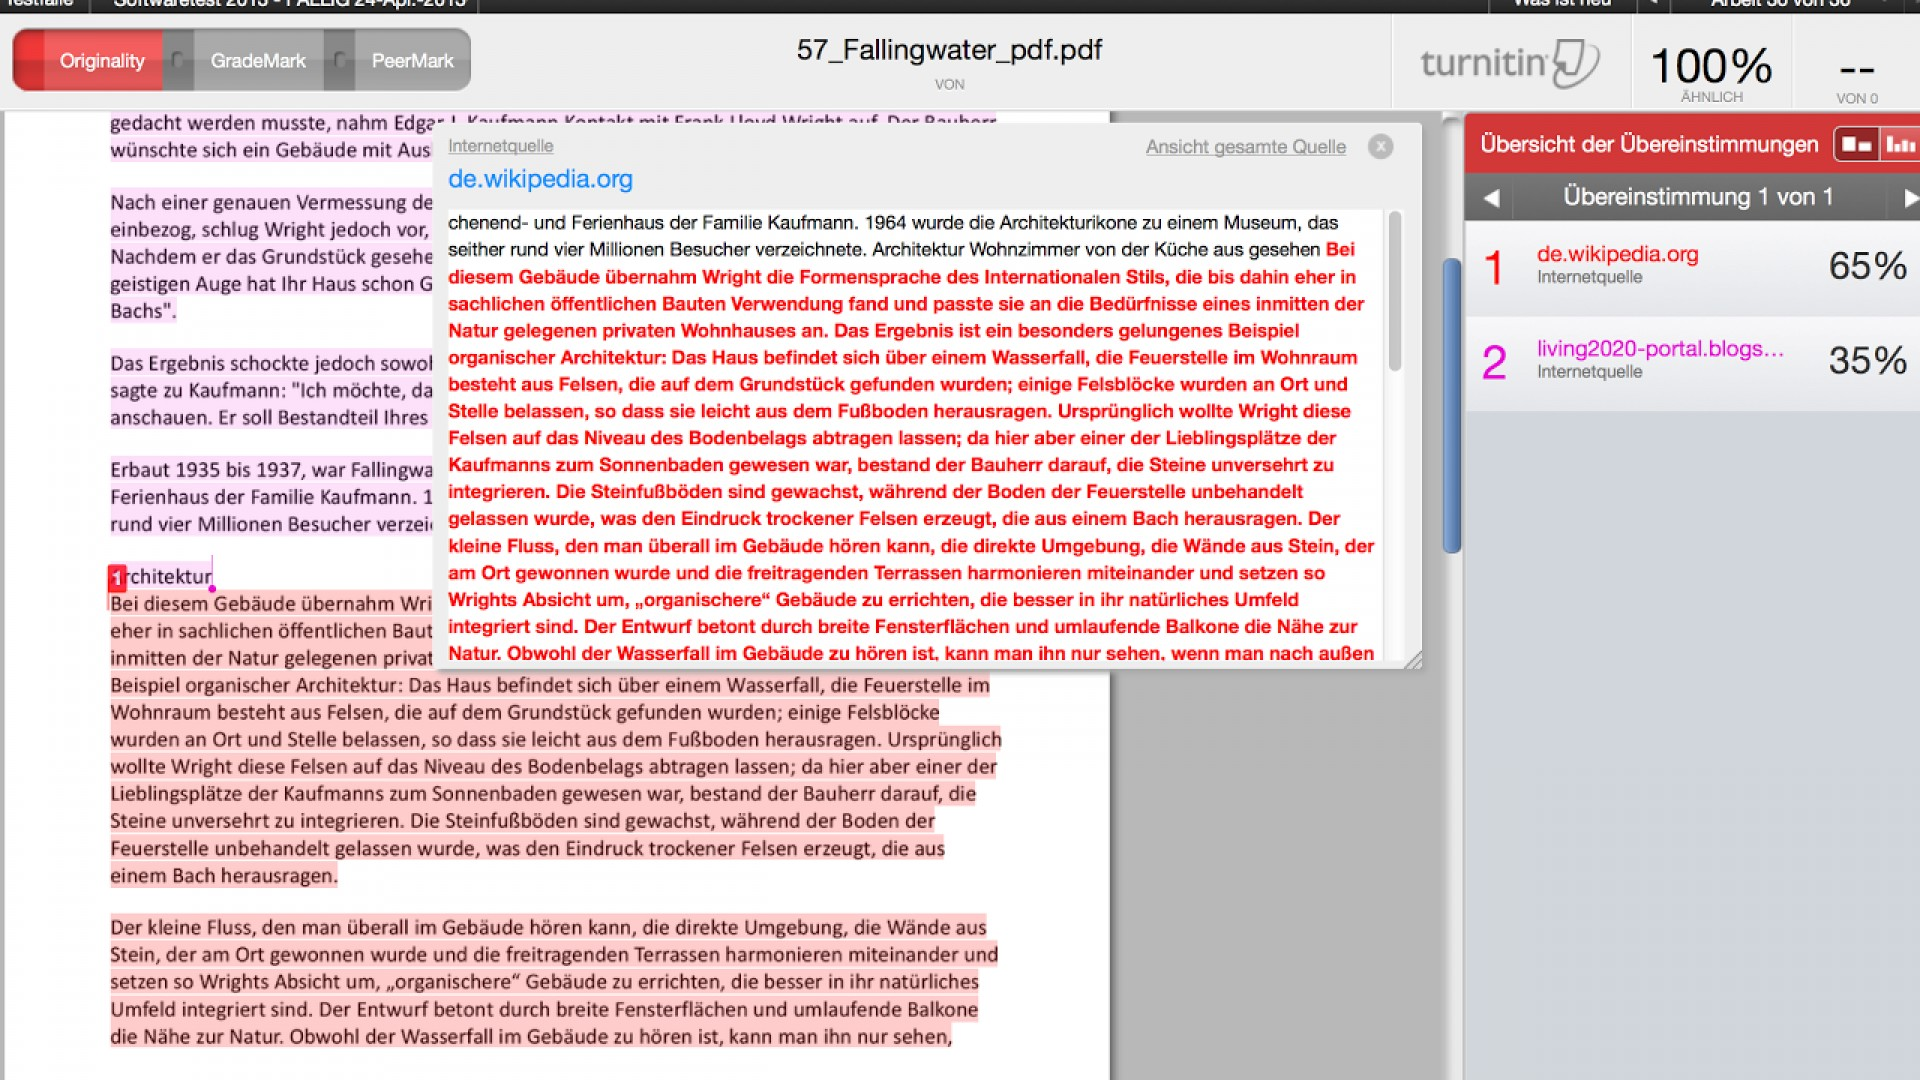 012 Essay Plagiarism Checker Maxresdefault Live Unforgettable Full Paper Free Turnitin Reddit 1920